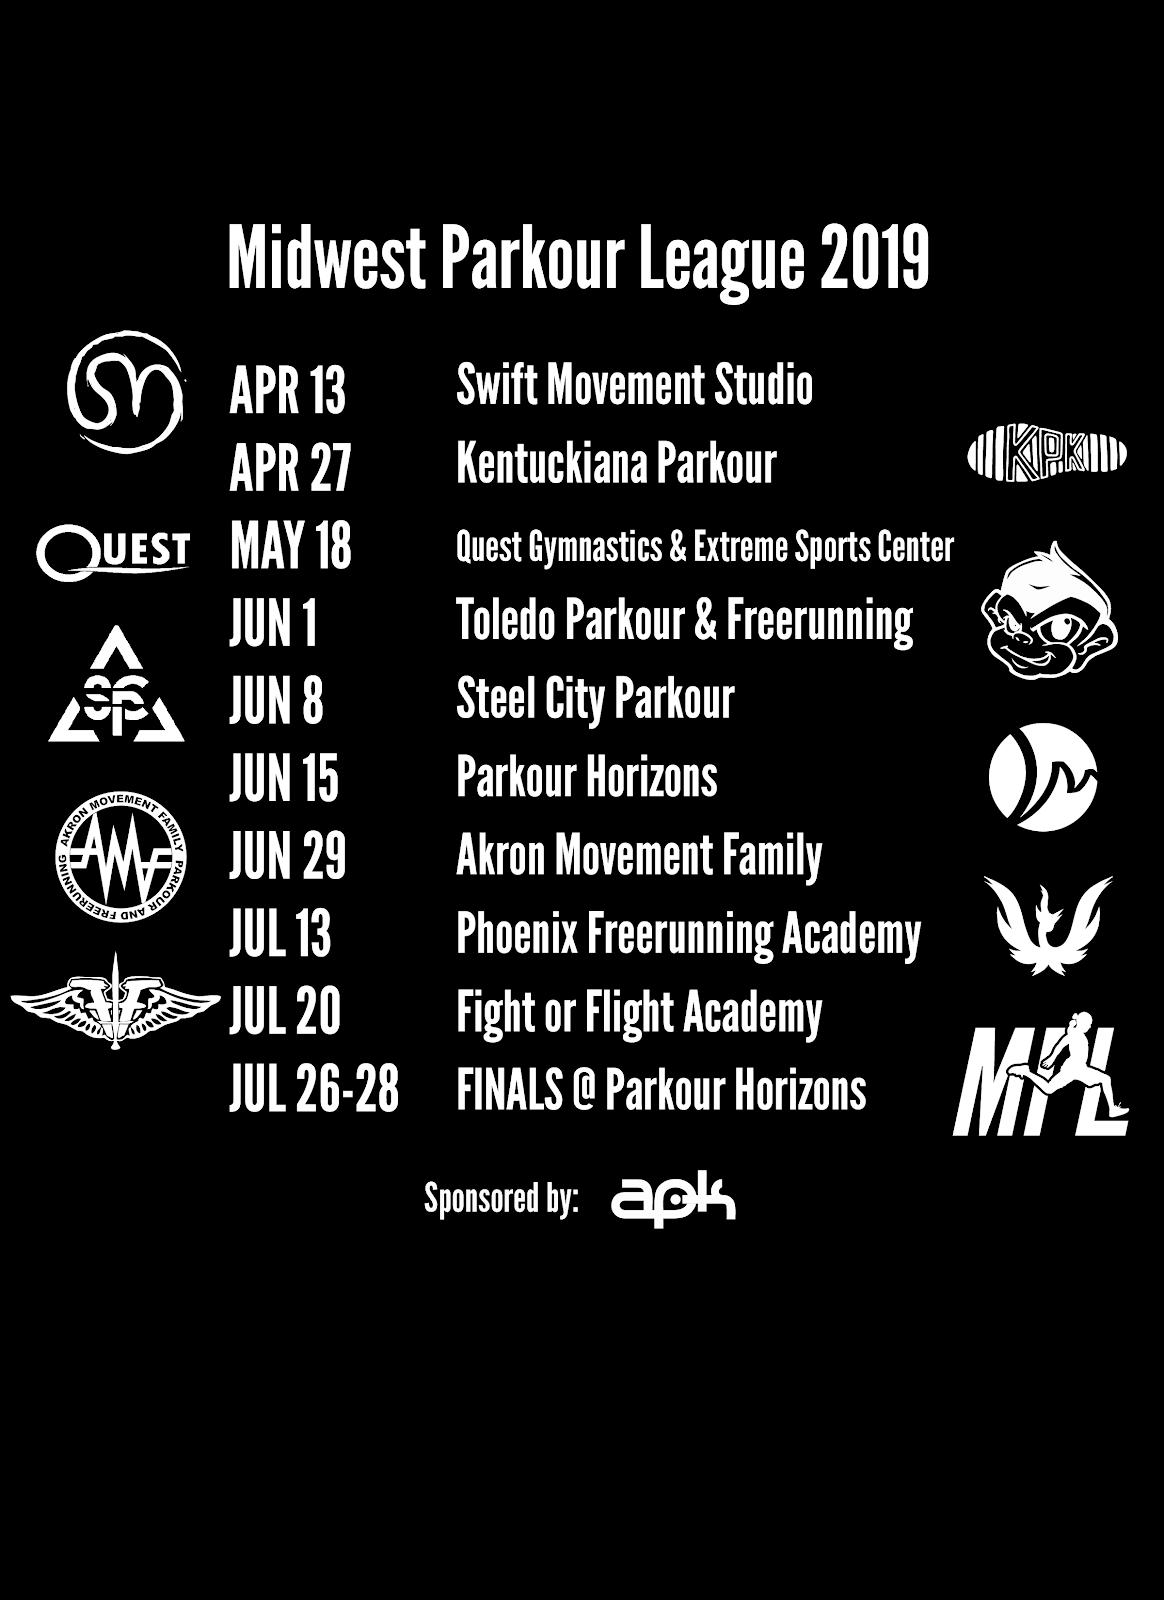 The Midwest Parkour League kicks off at Swift Movement